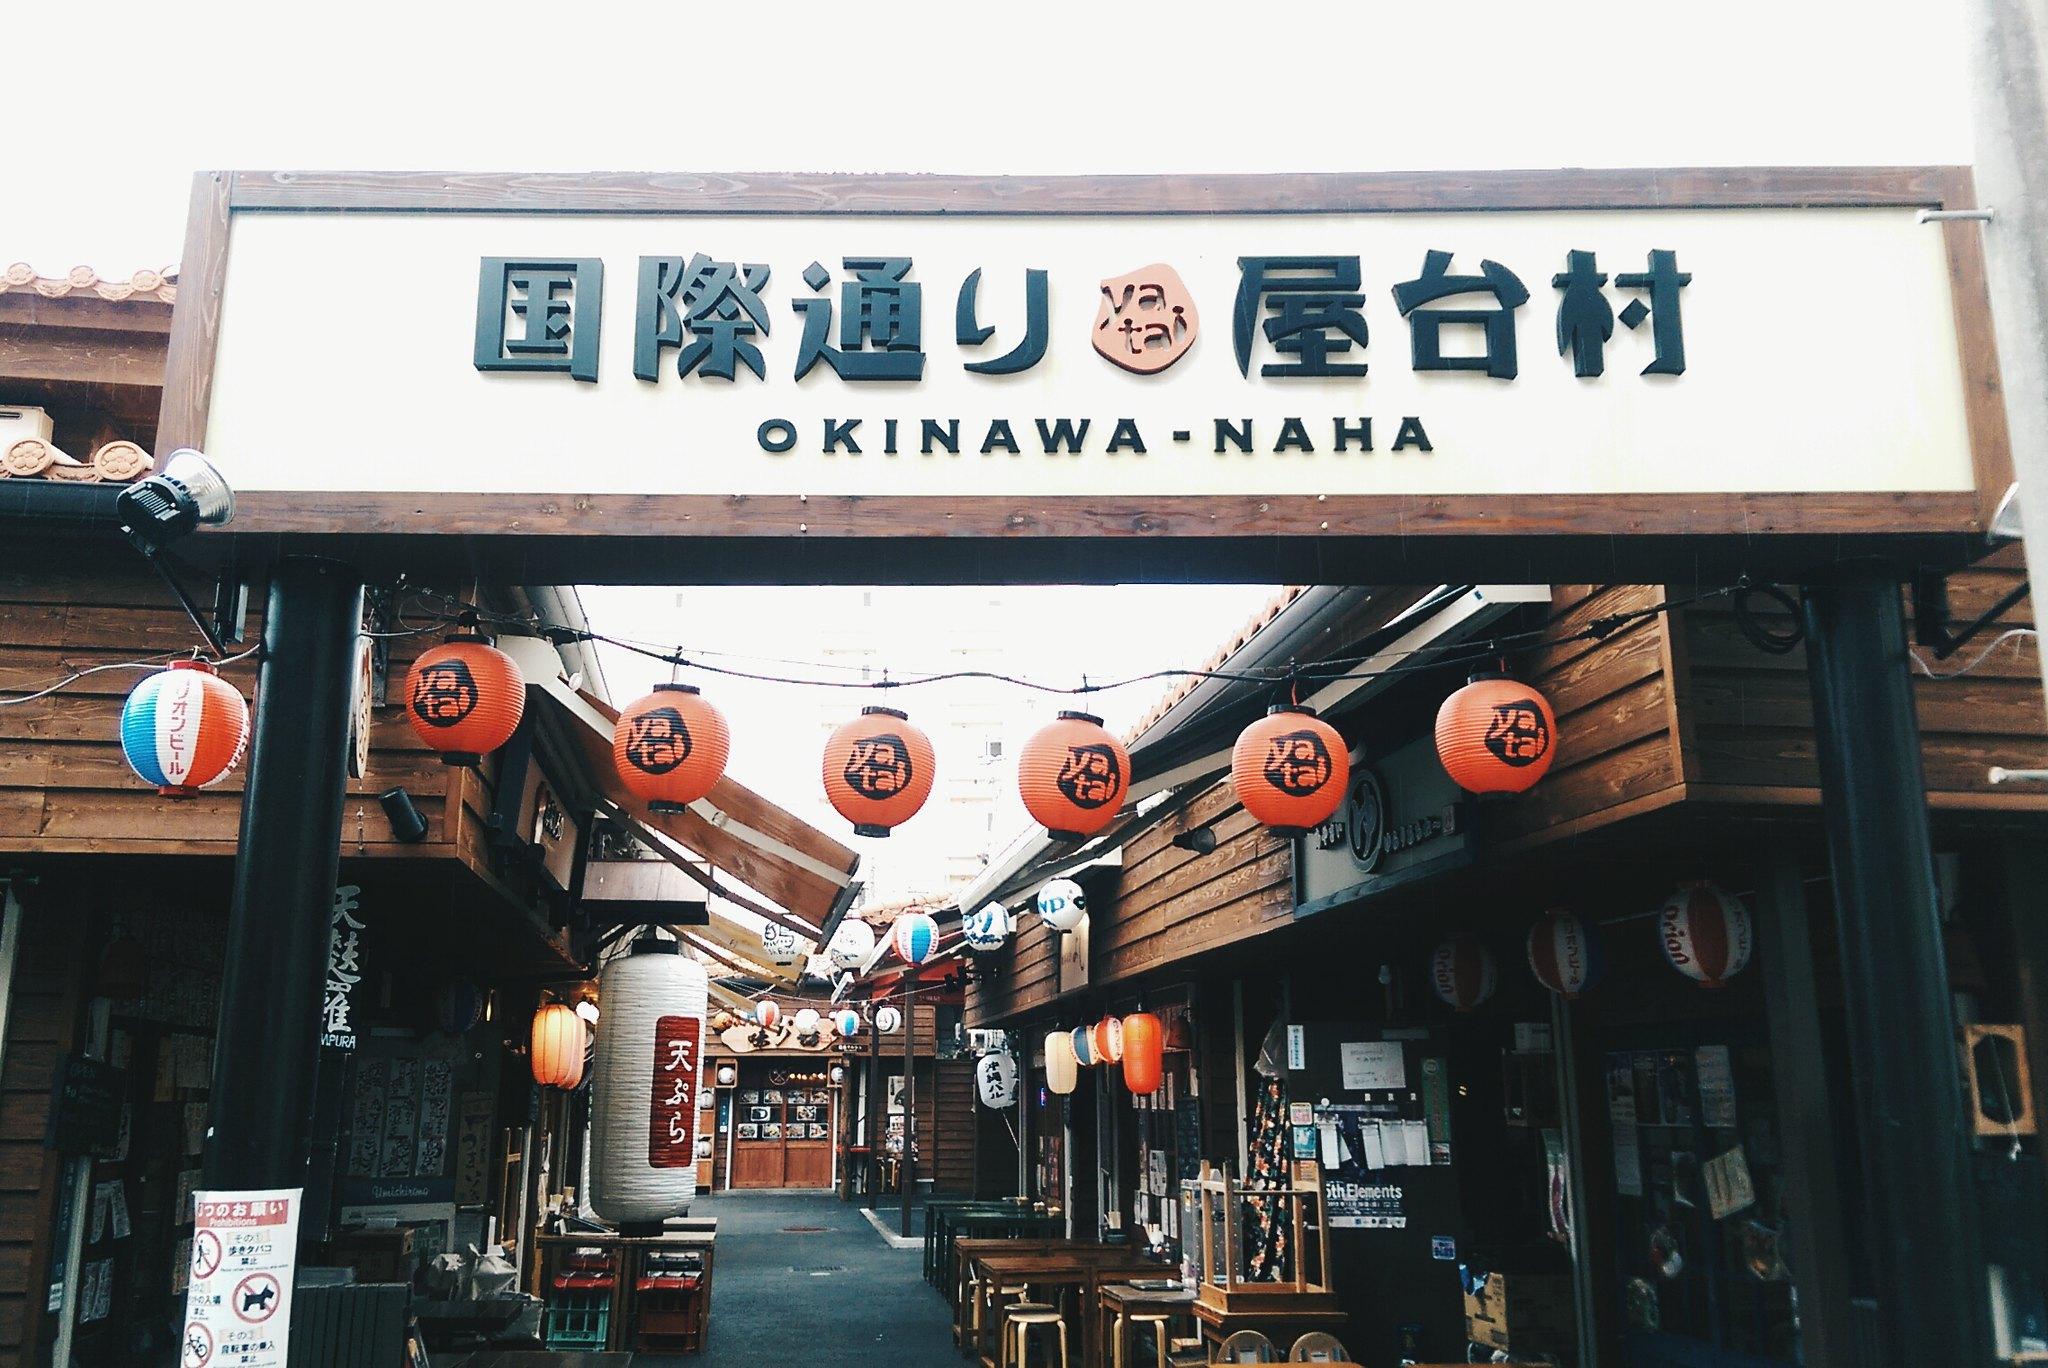 okinawa kokusai street food